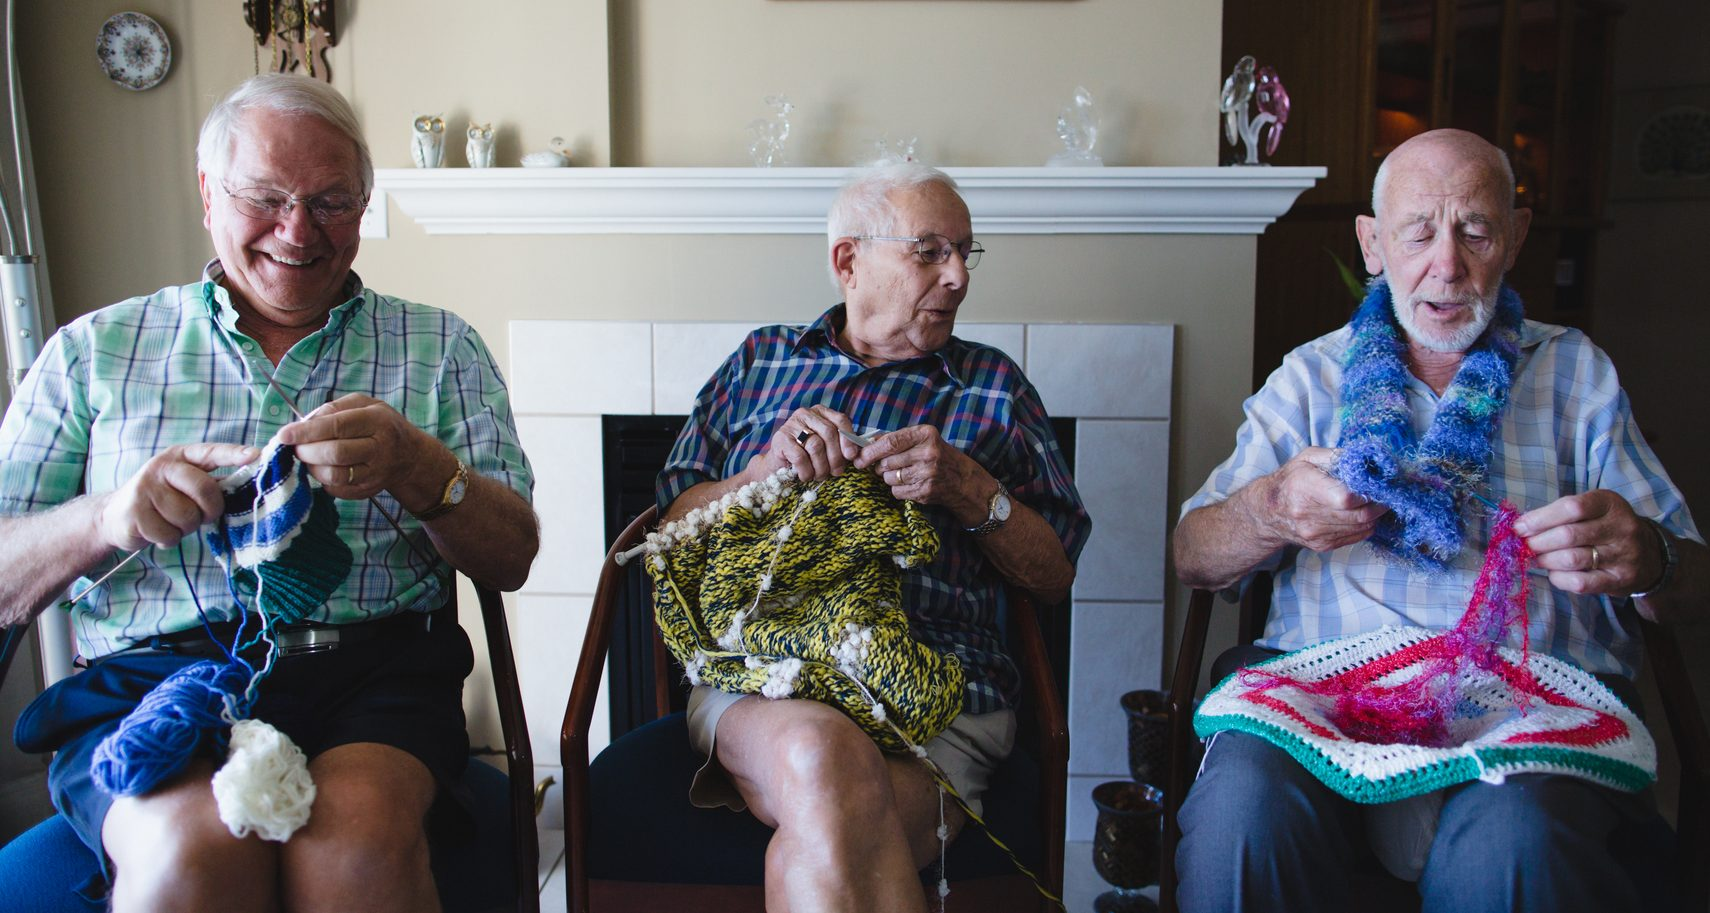 Group of senior men knitting together